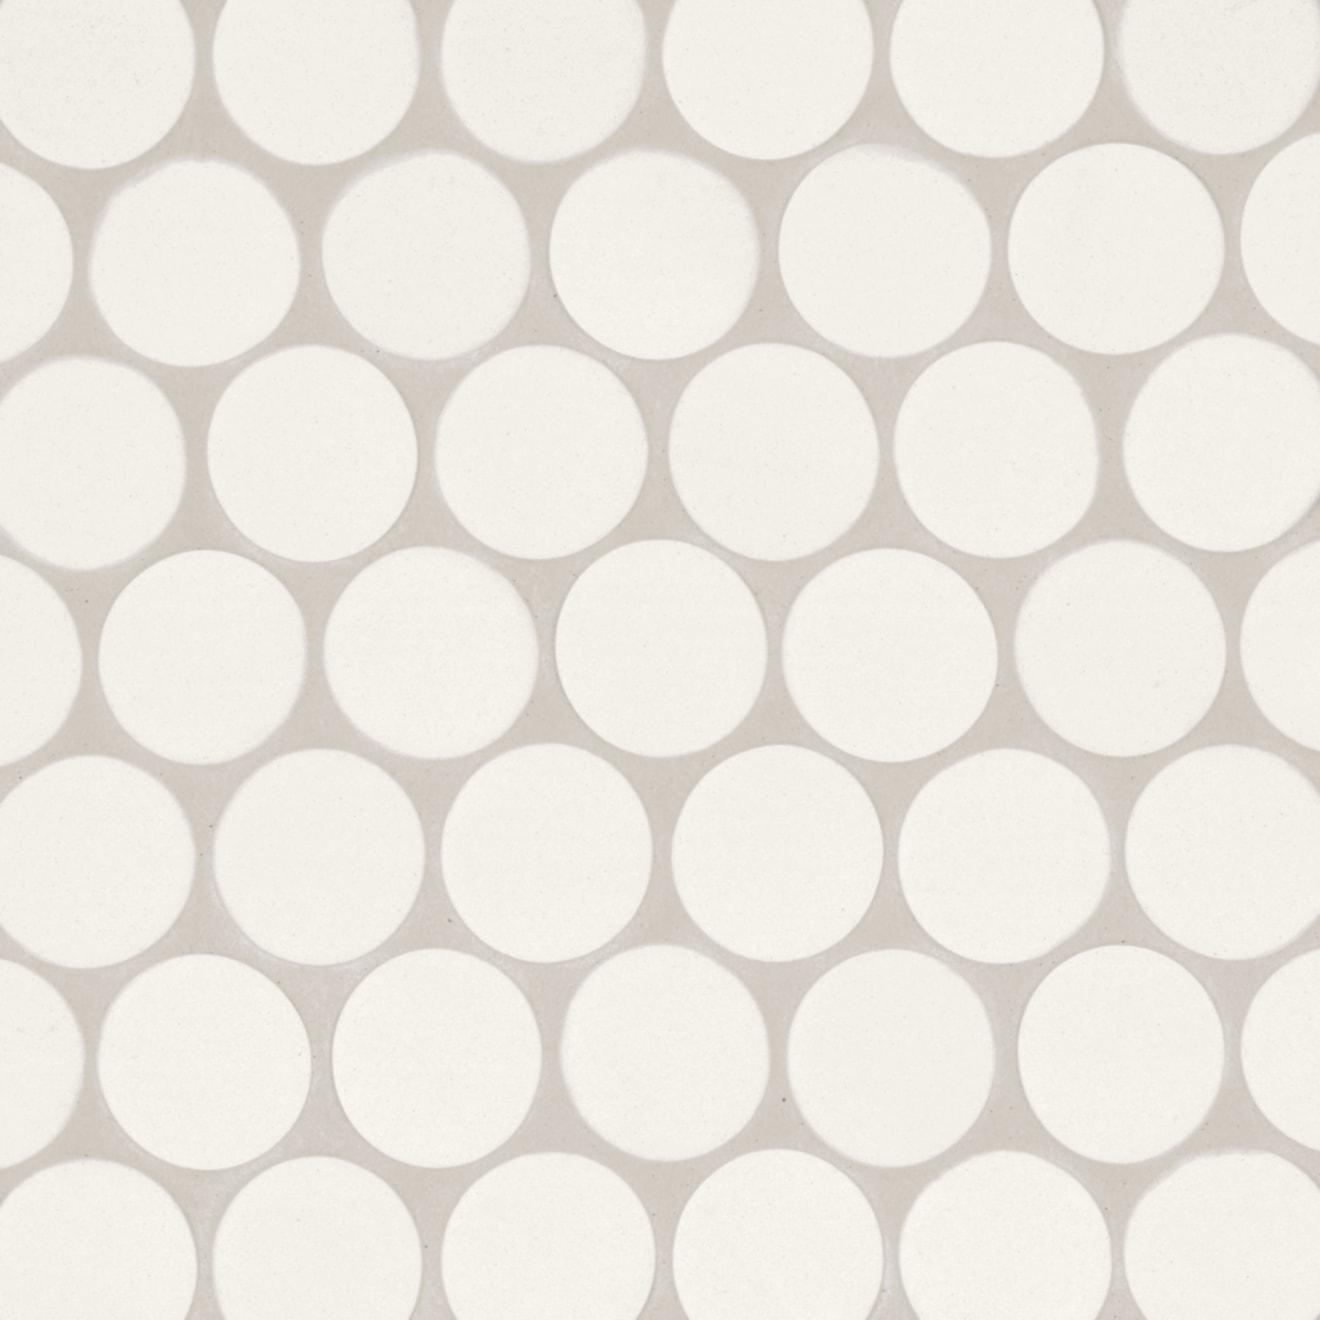 "Makoto 2"" Round Matte Porcelain Floor and Wall Mosaic in Shoji White"